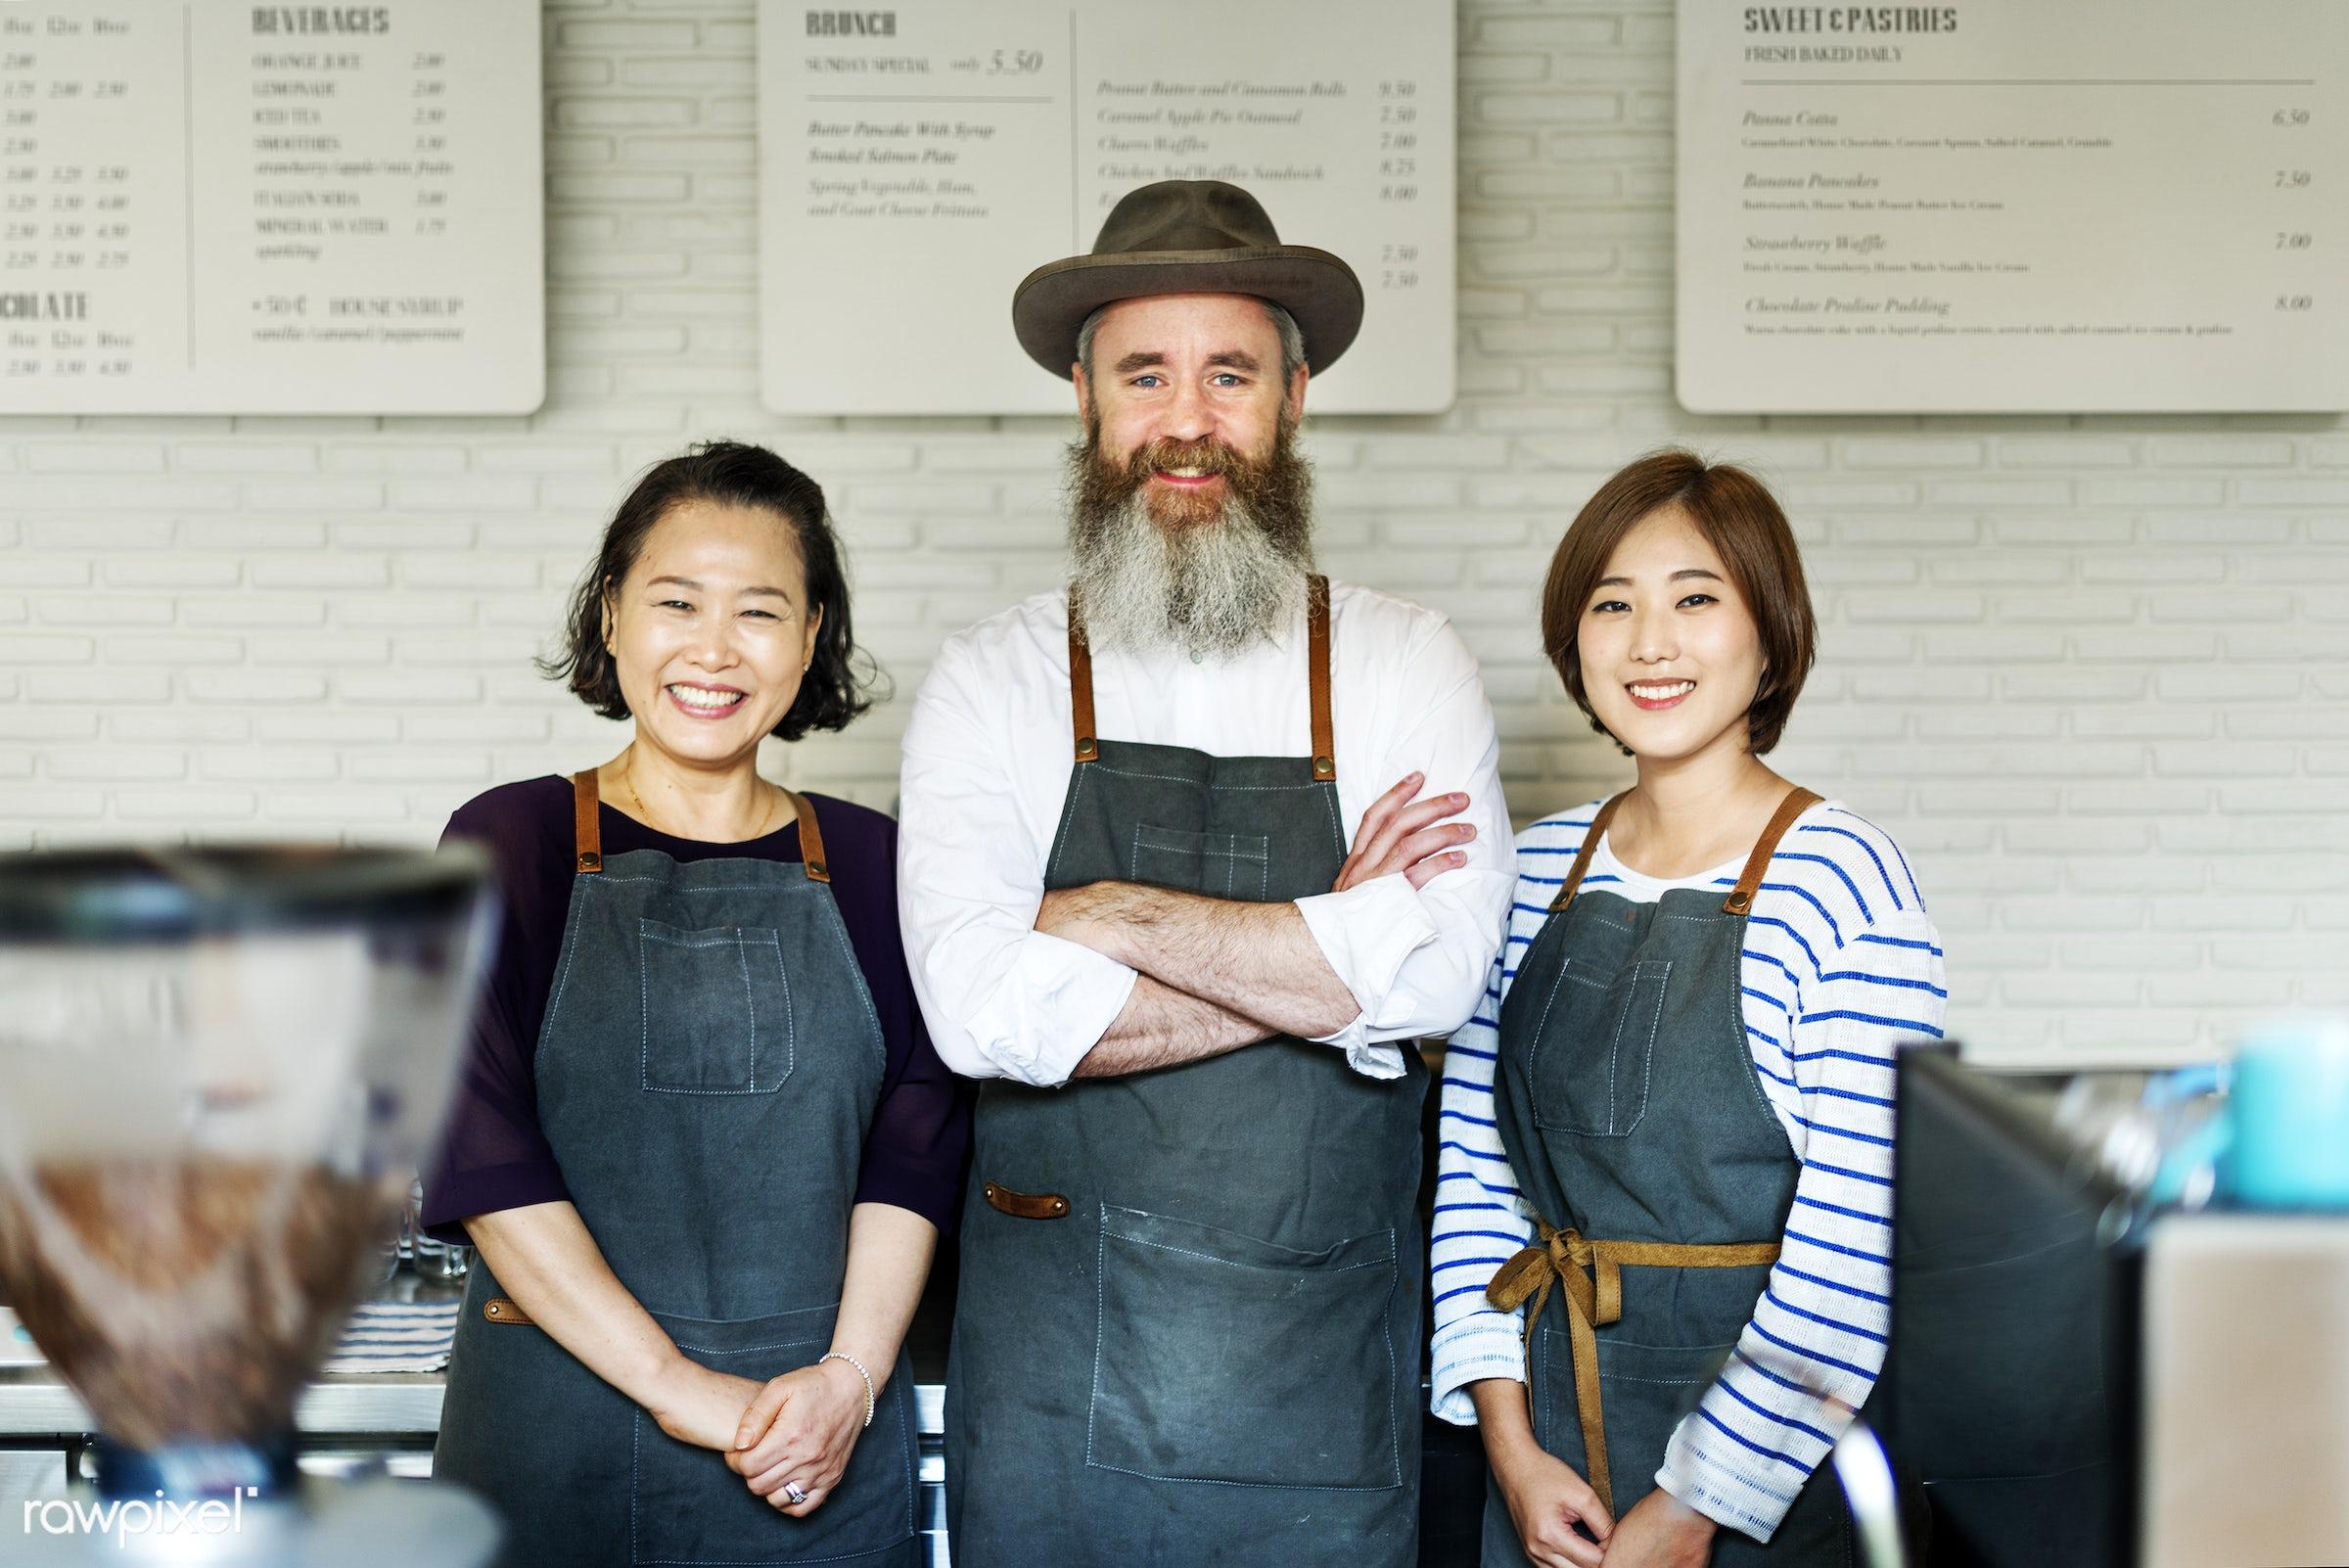 Barista team at coffee shop - apron, asian, barista, beverage, career, cheerful, coffee, coffee shop, friends, friendship,...